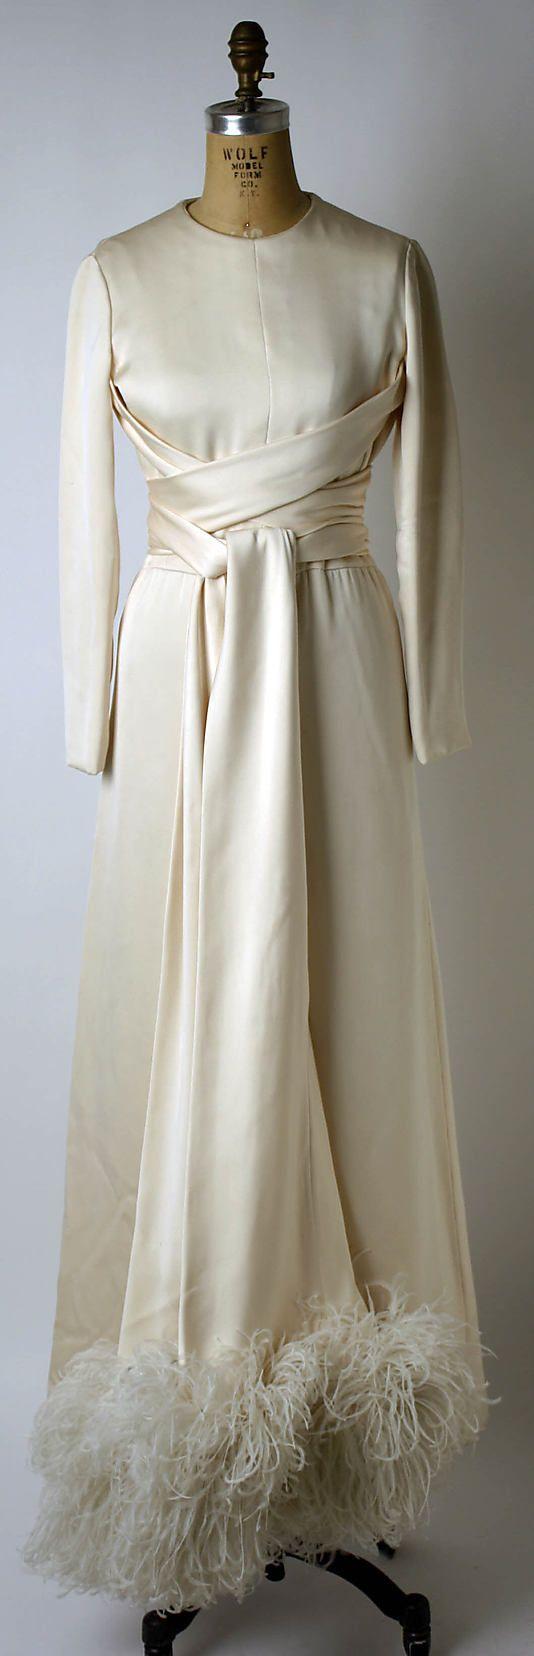 Valentino Dress - late 1960's - by Valentino (Italian, born 1932) - Silk…